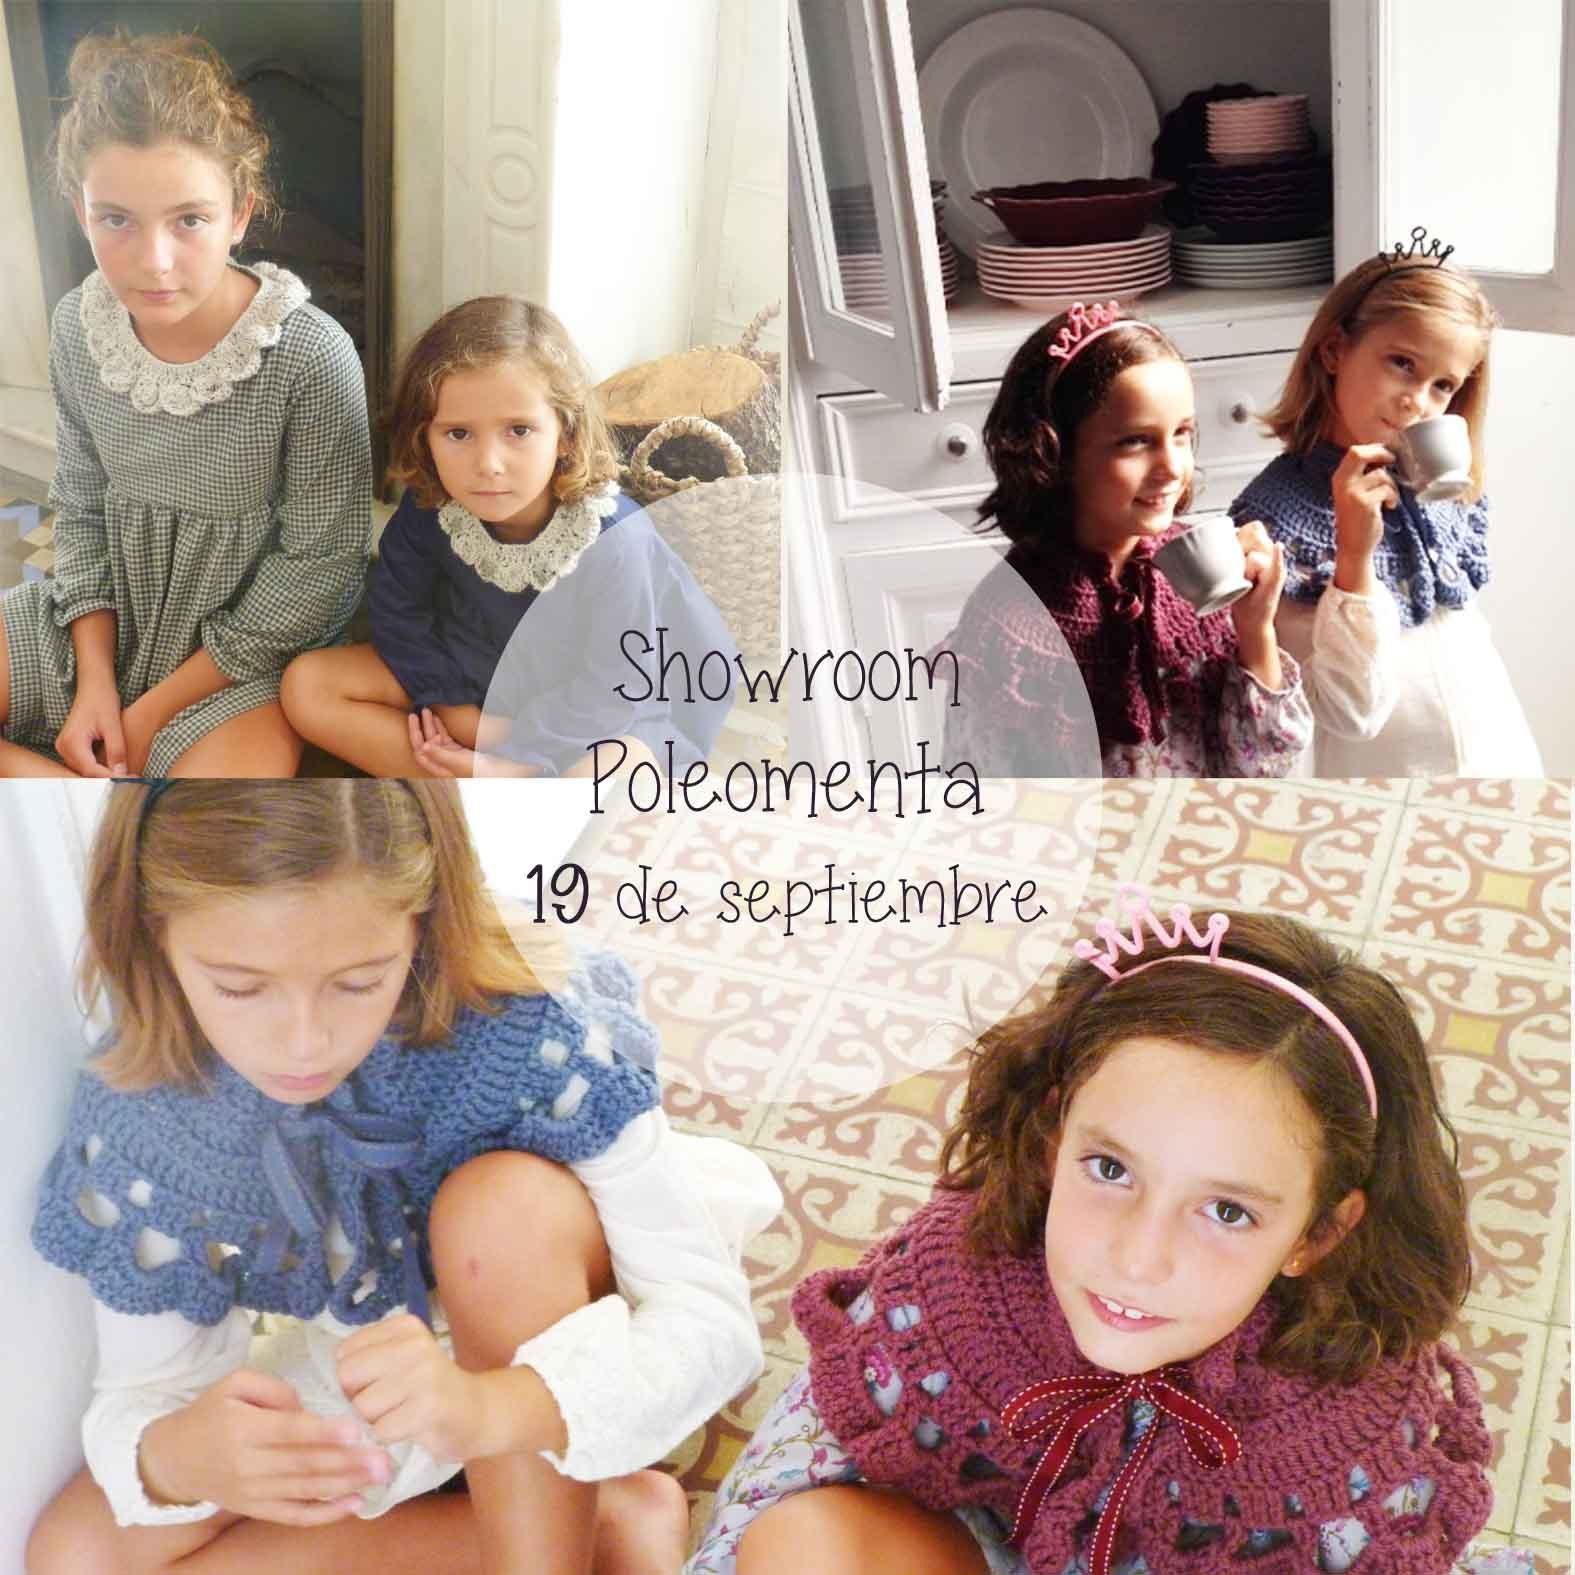 Otoño-invierno 2014 by Poleomenta